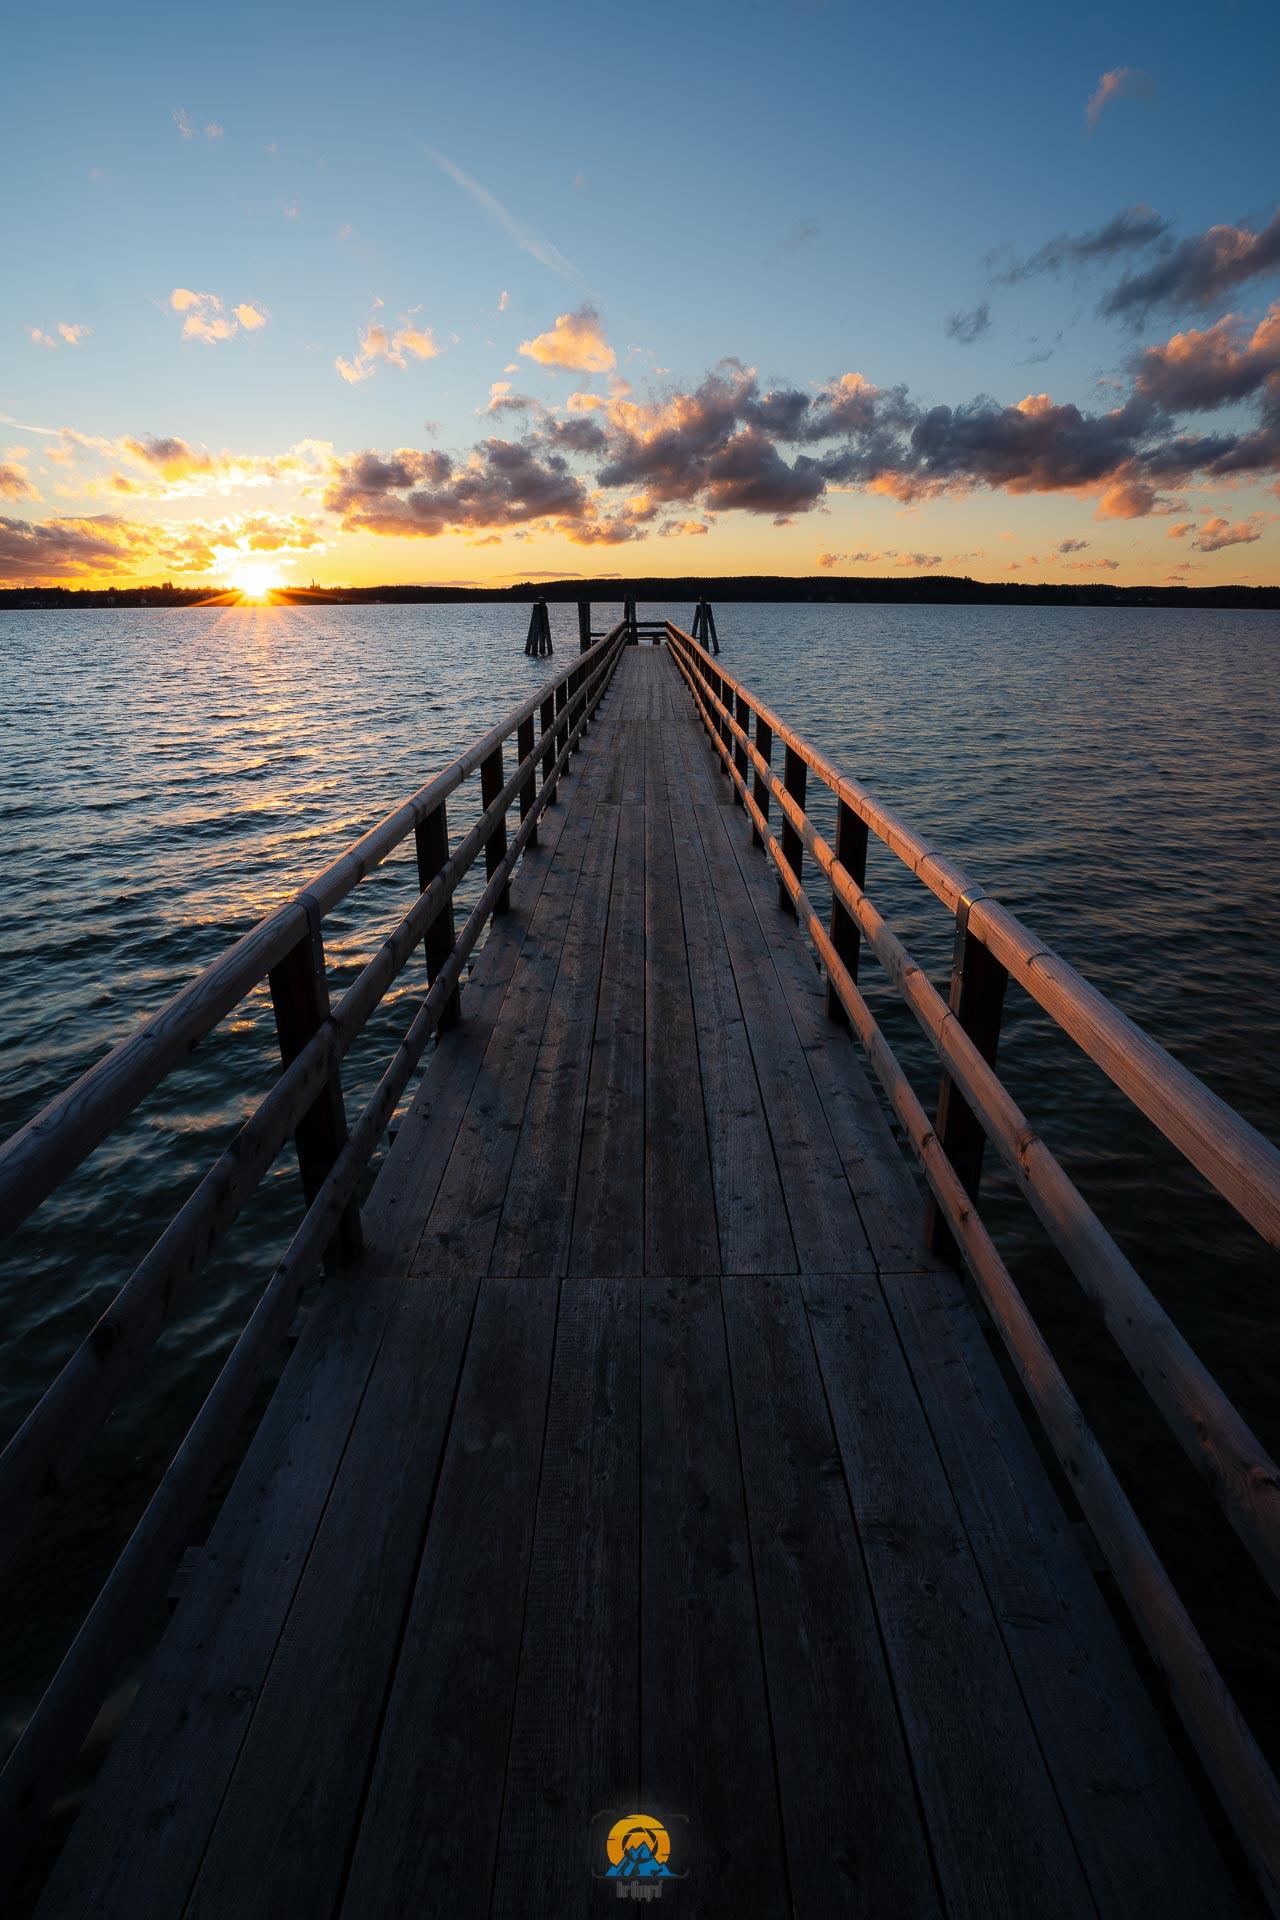 07. März 2019 - Buch a.A Sonnenuntergang.jpg